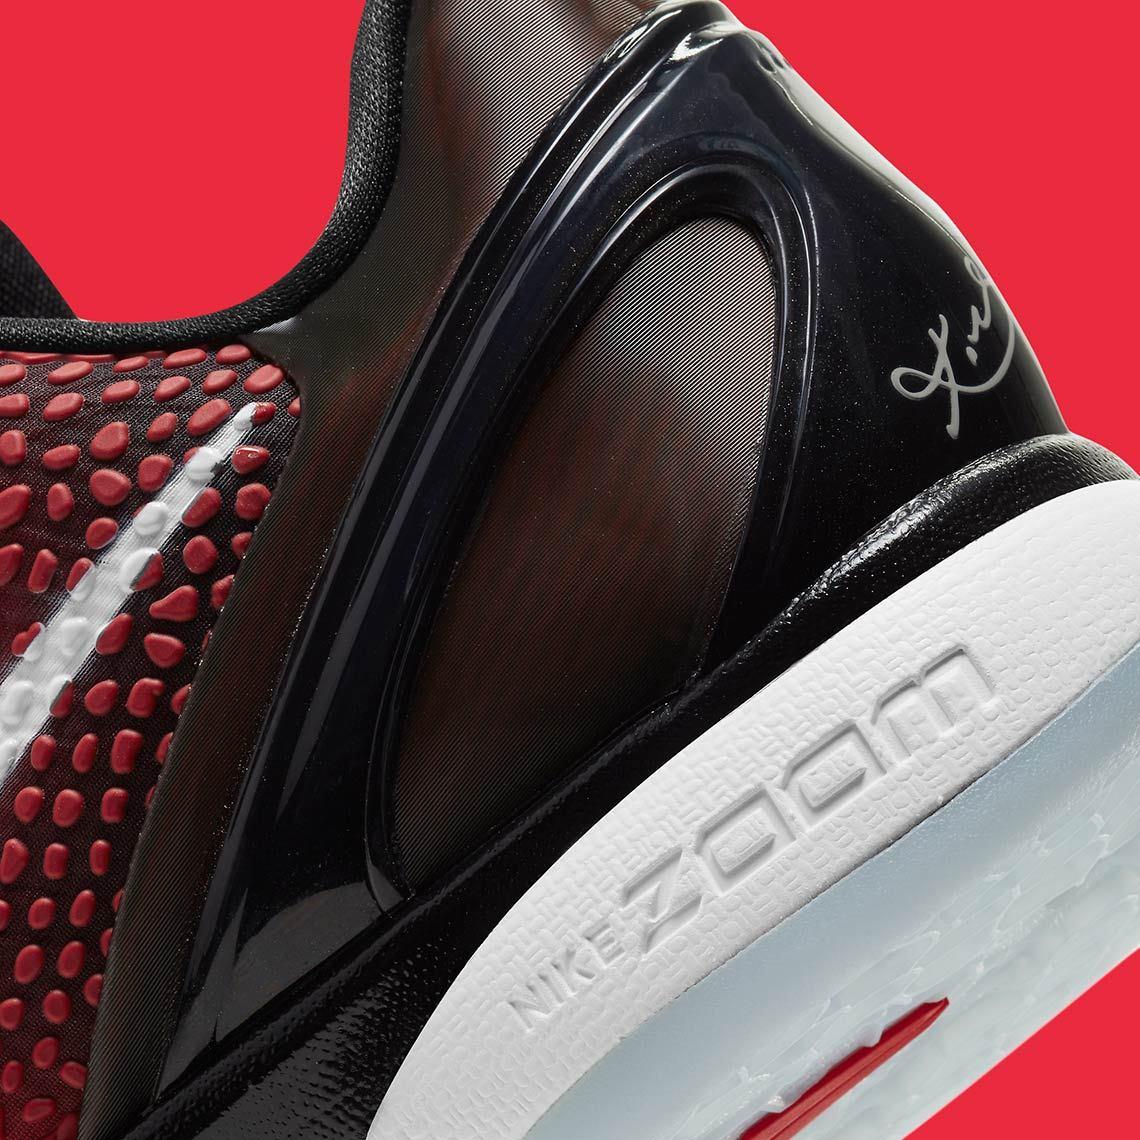 Nike Kobe 6 All Star Protro DH9888-600